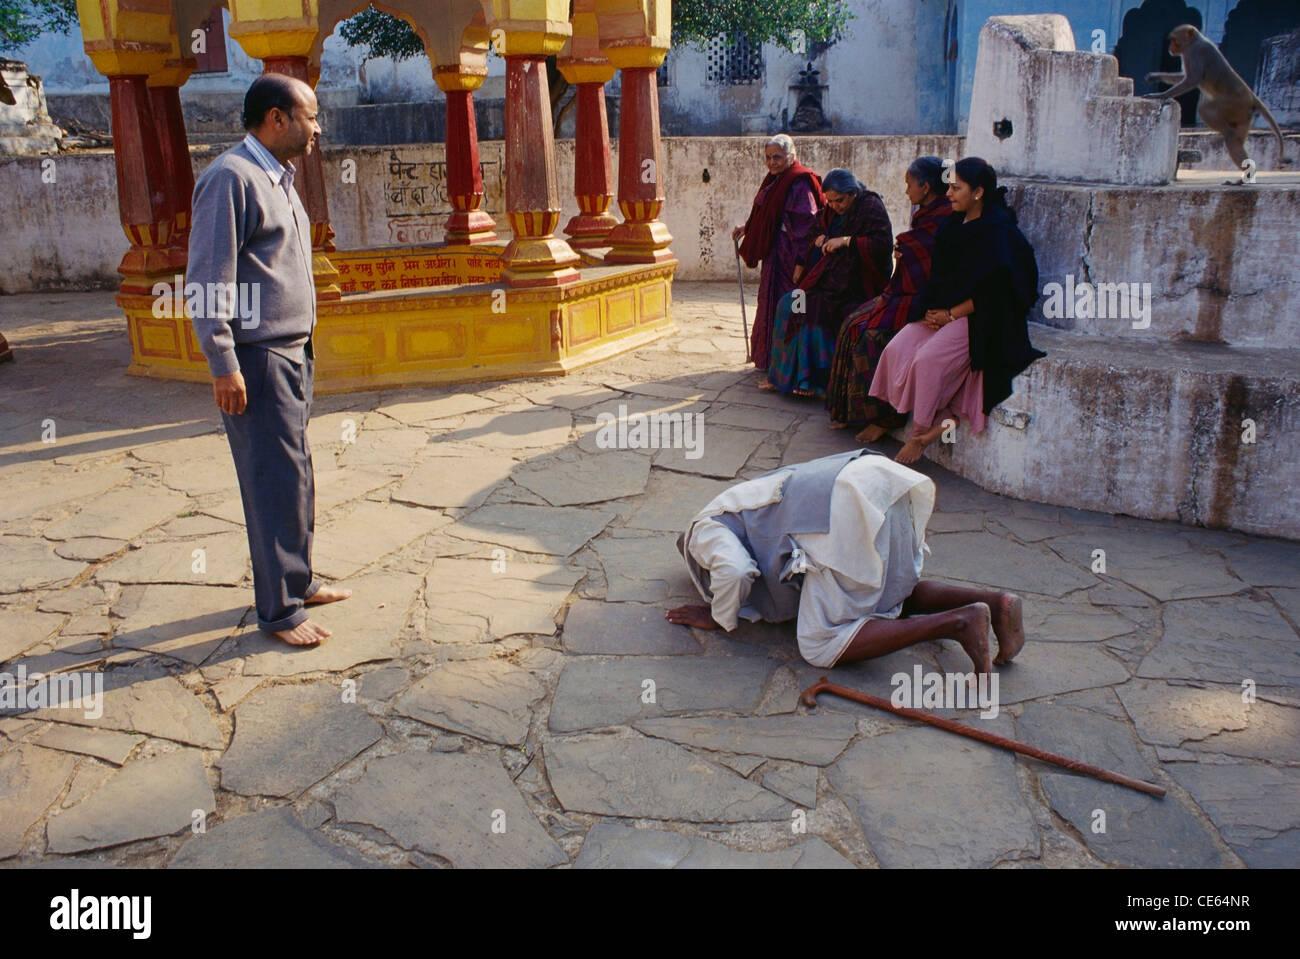 Indian family Lord Rama Chitrakoot greetings Uttar Pradesh India   Model Released - Stock Image